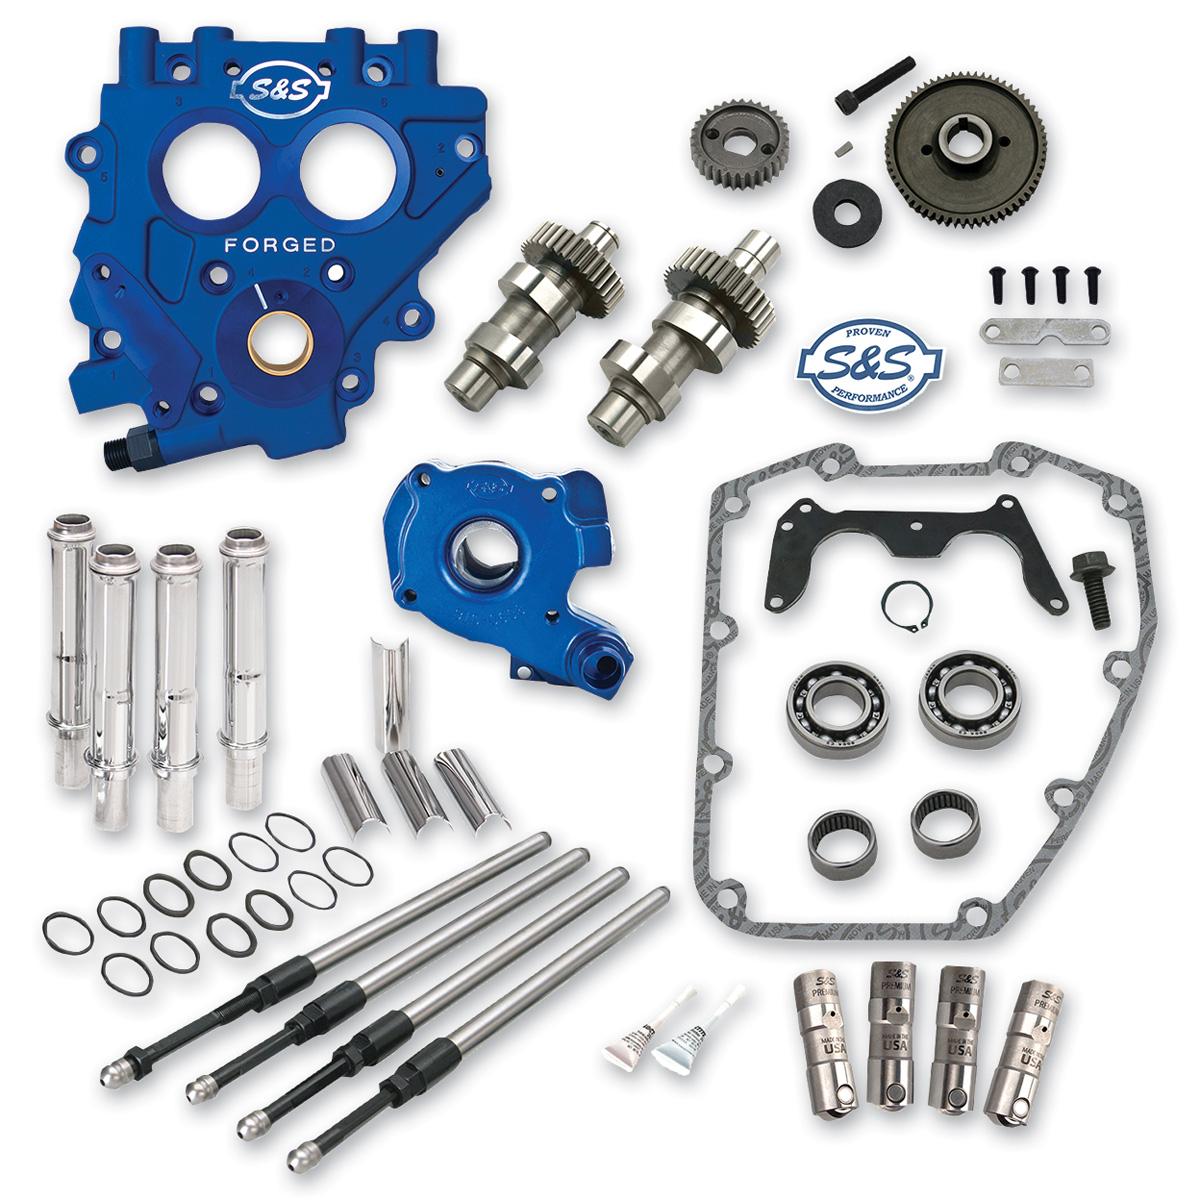 Harley Davidson Engines Shovelhead Engine Diagram Panhead Ss Cycle 509g Standard Gear Drive Cam Chest Kit